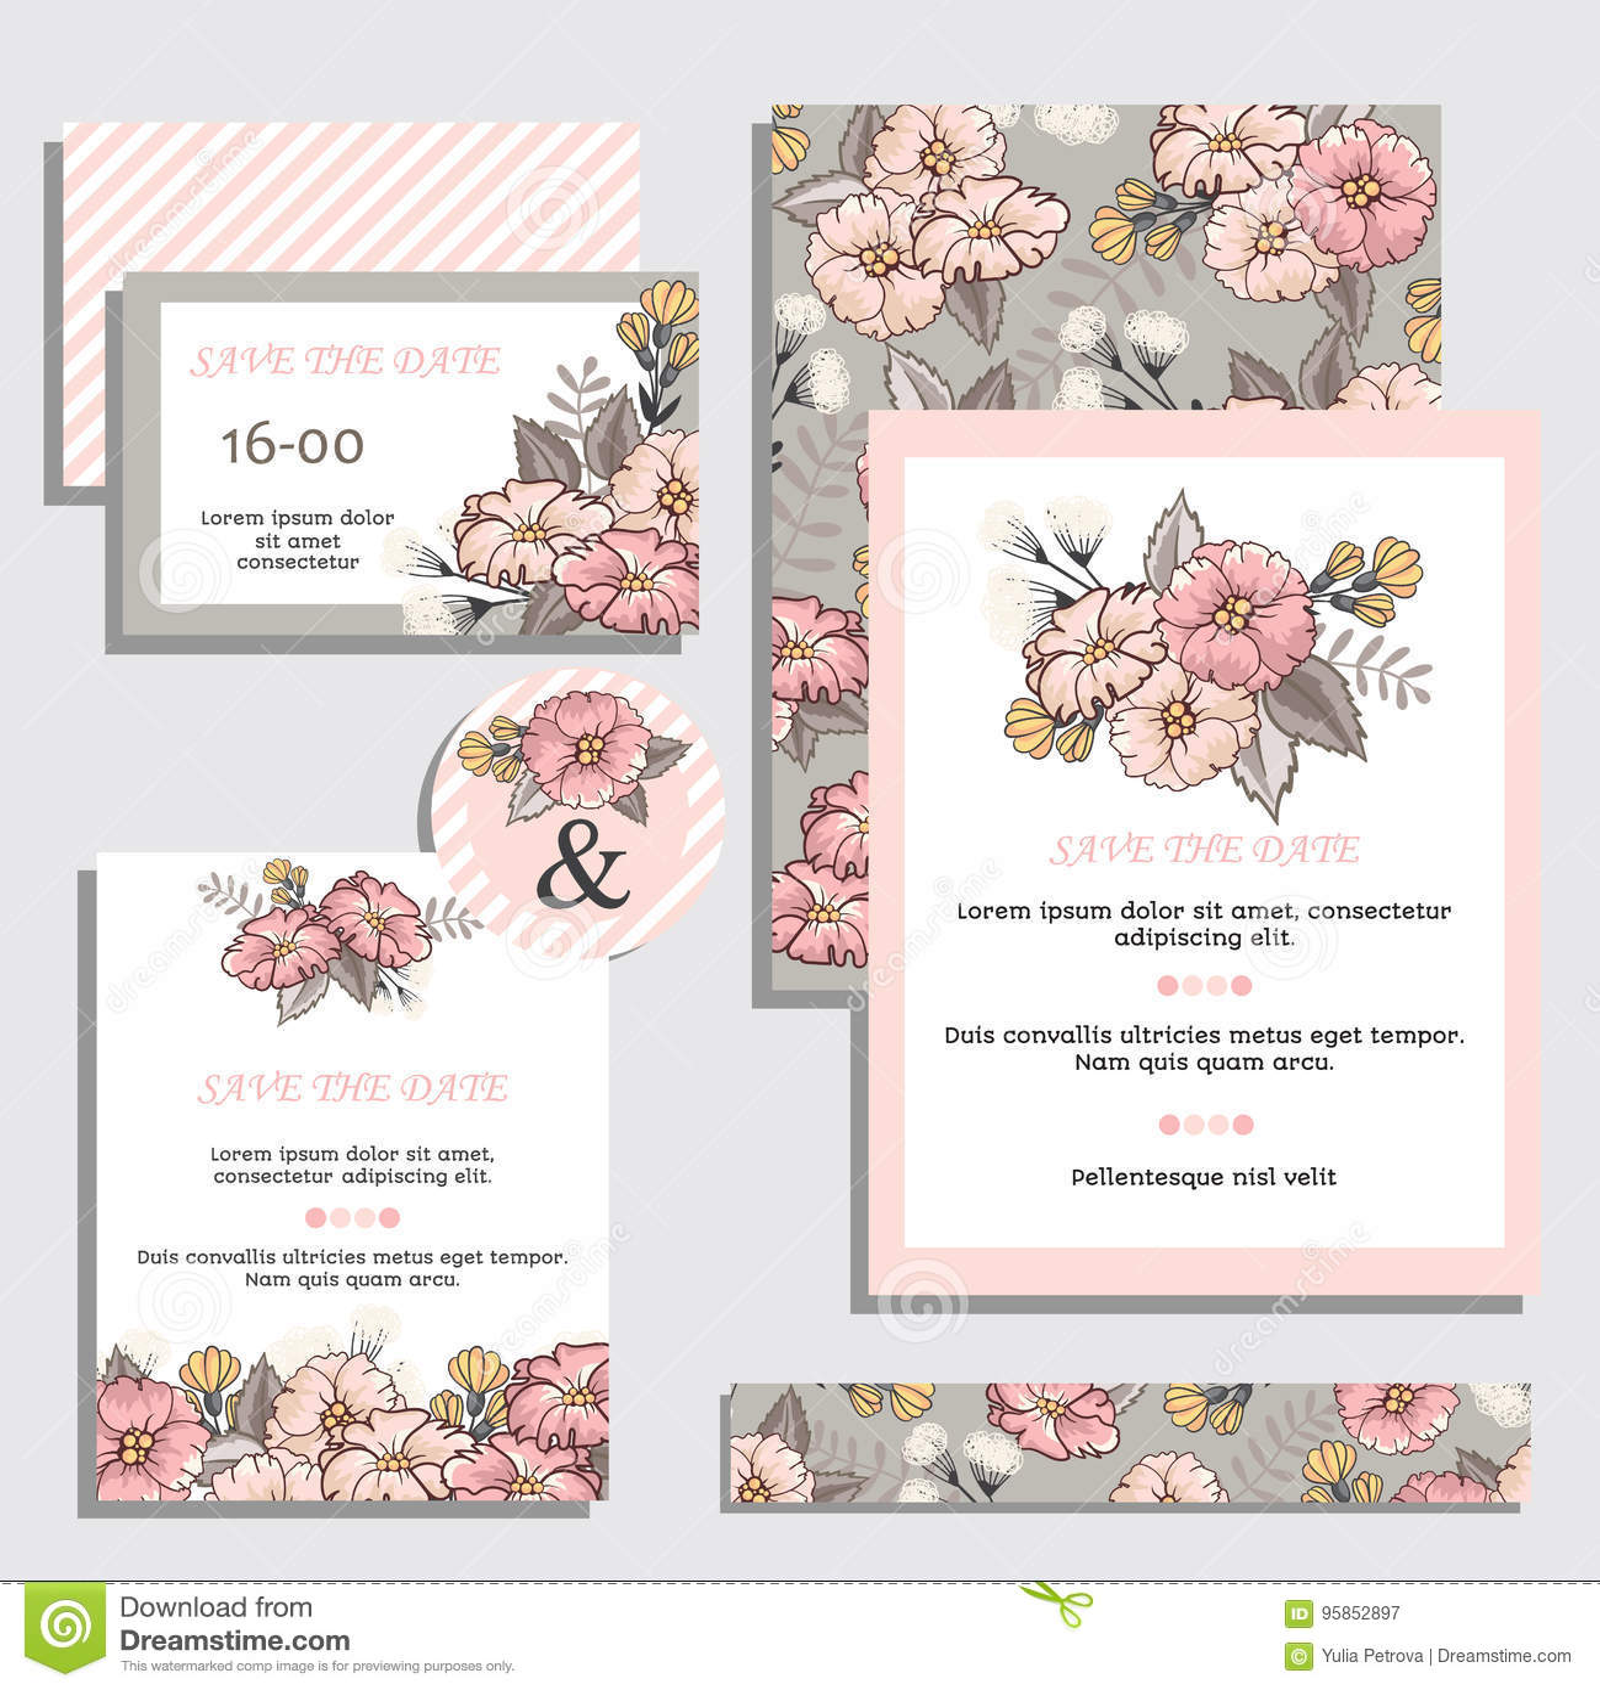 set of vintage wedding invitation cards stock vector illustration of anniversary holiday 95852897 dreamstime com